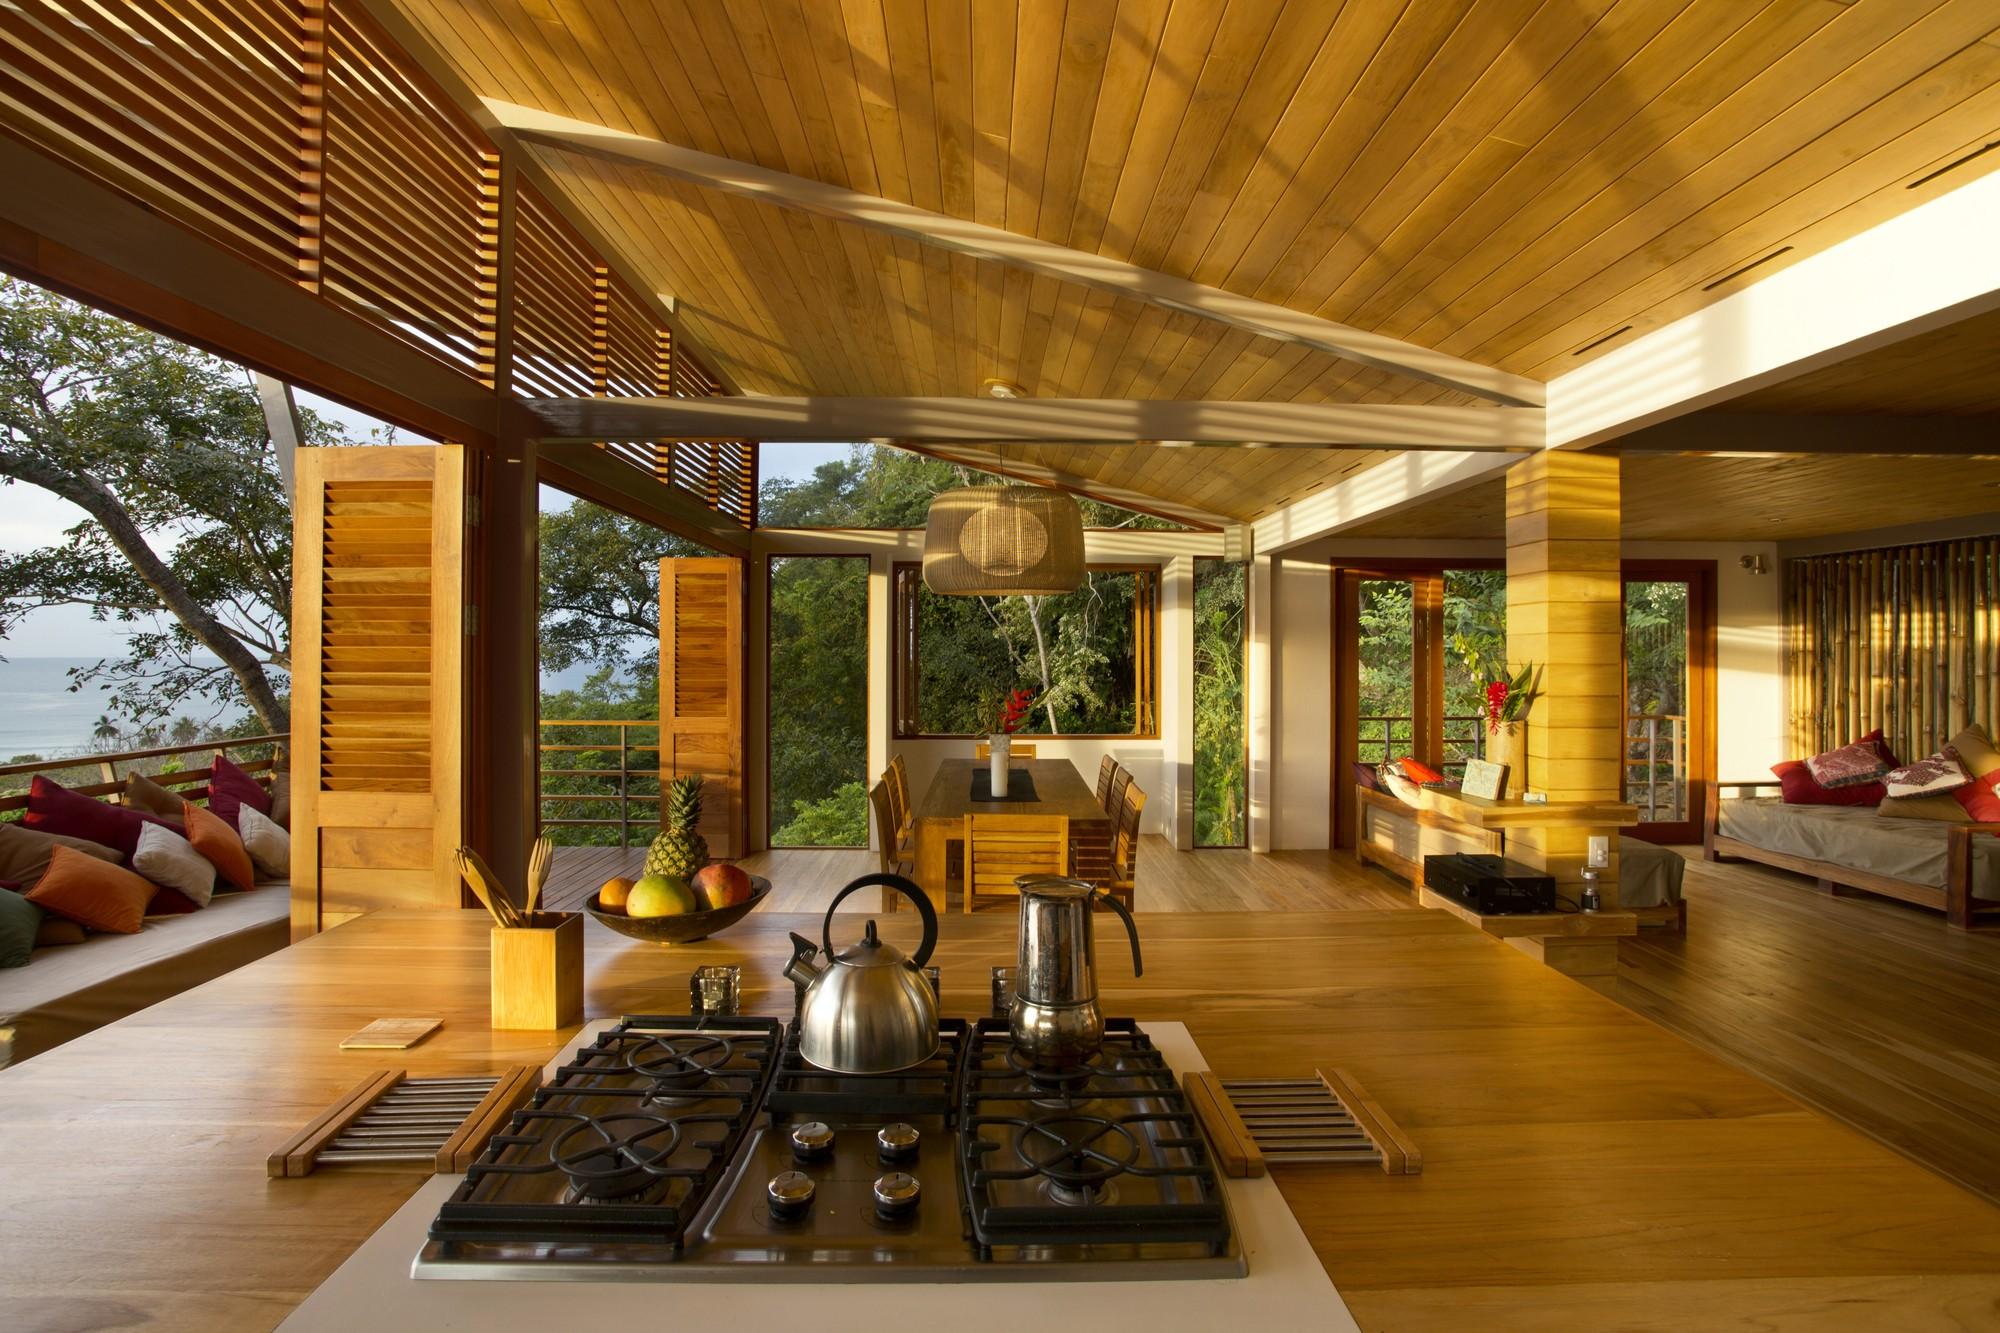 Gallery of flotanta house benjamin garcia saxe for Modelos de jardines interiores